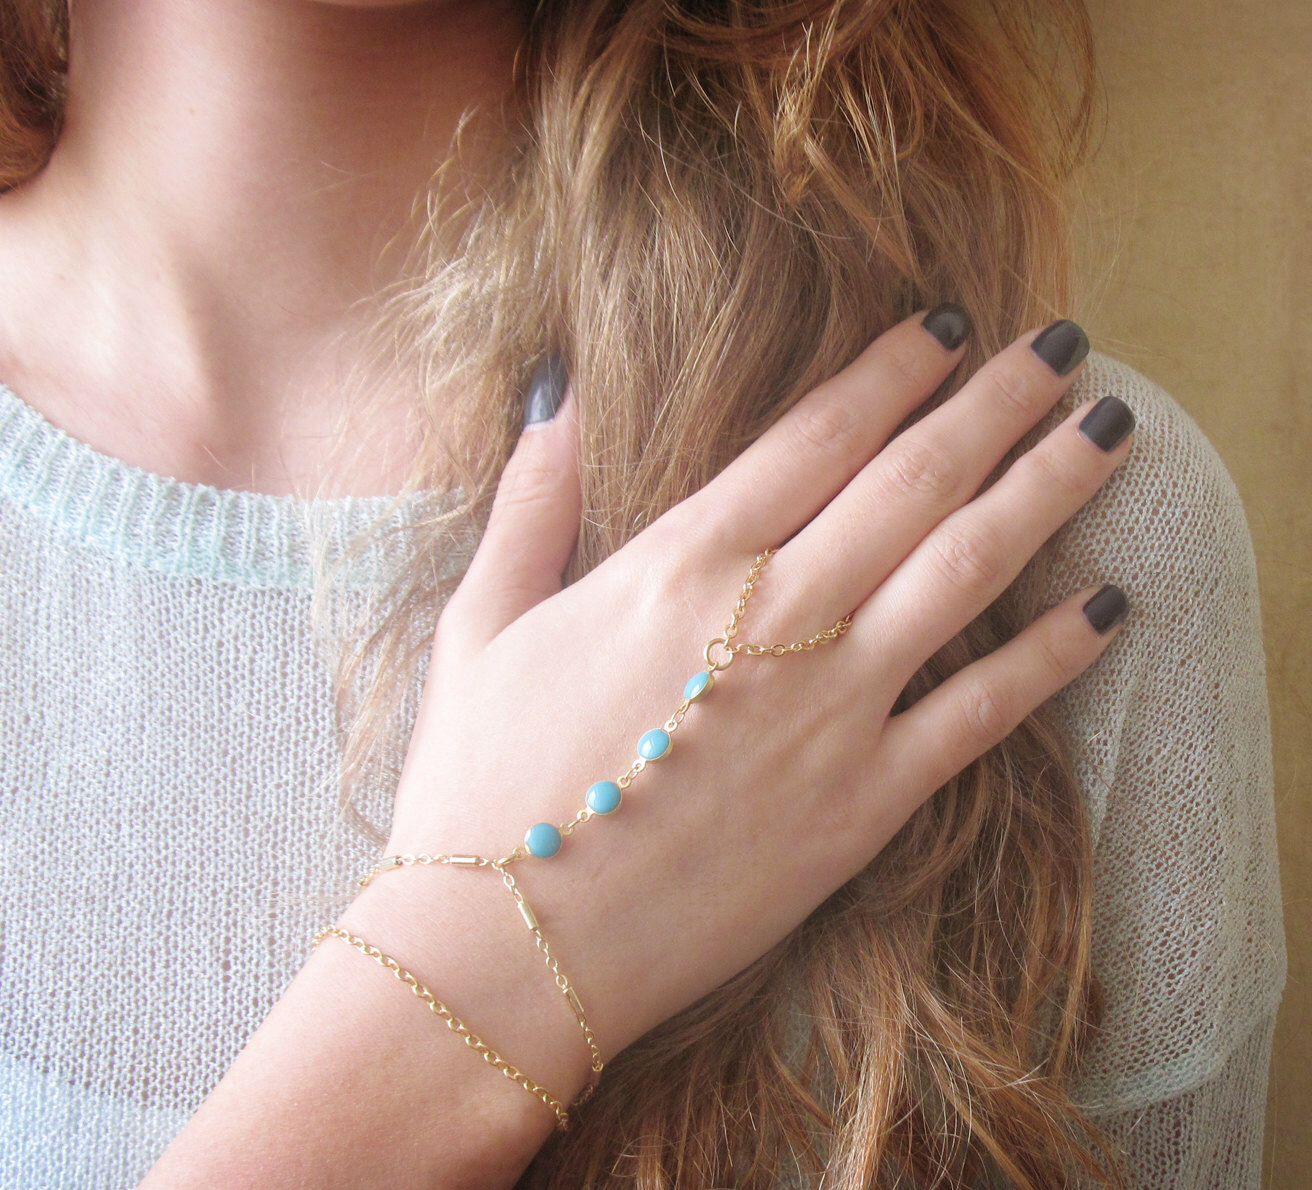 Hand Chain Bracelet - Gold Slave Bracelet - Ring Bracelet - Harem bracelet - Belly Dancers Bracelet - Gold Finger Bracelet - Slave Ring by baronykajd on Etsy https://www.etsy.com/listing/216044289/hand-chain-bracelet-gold-slave-bracelet